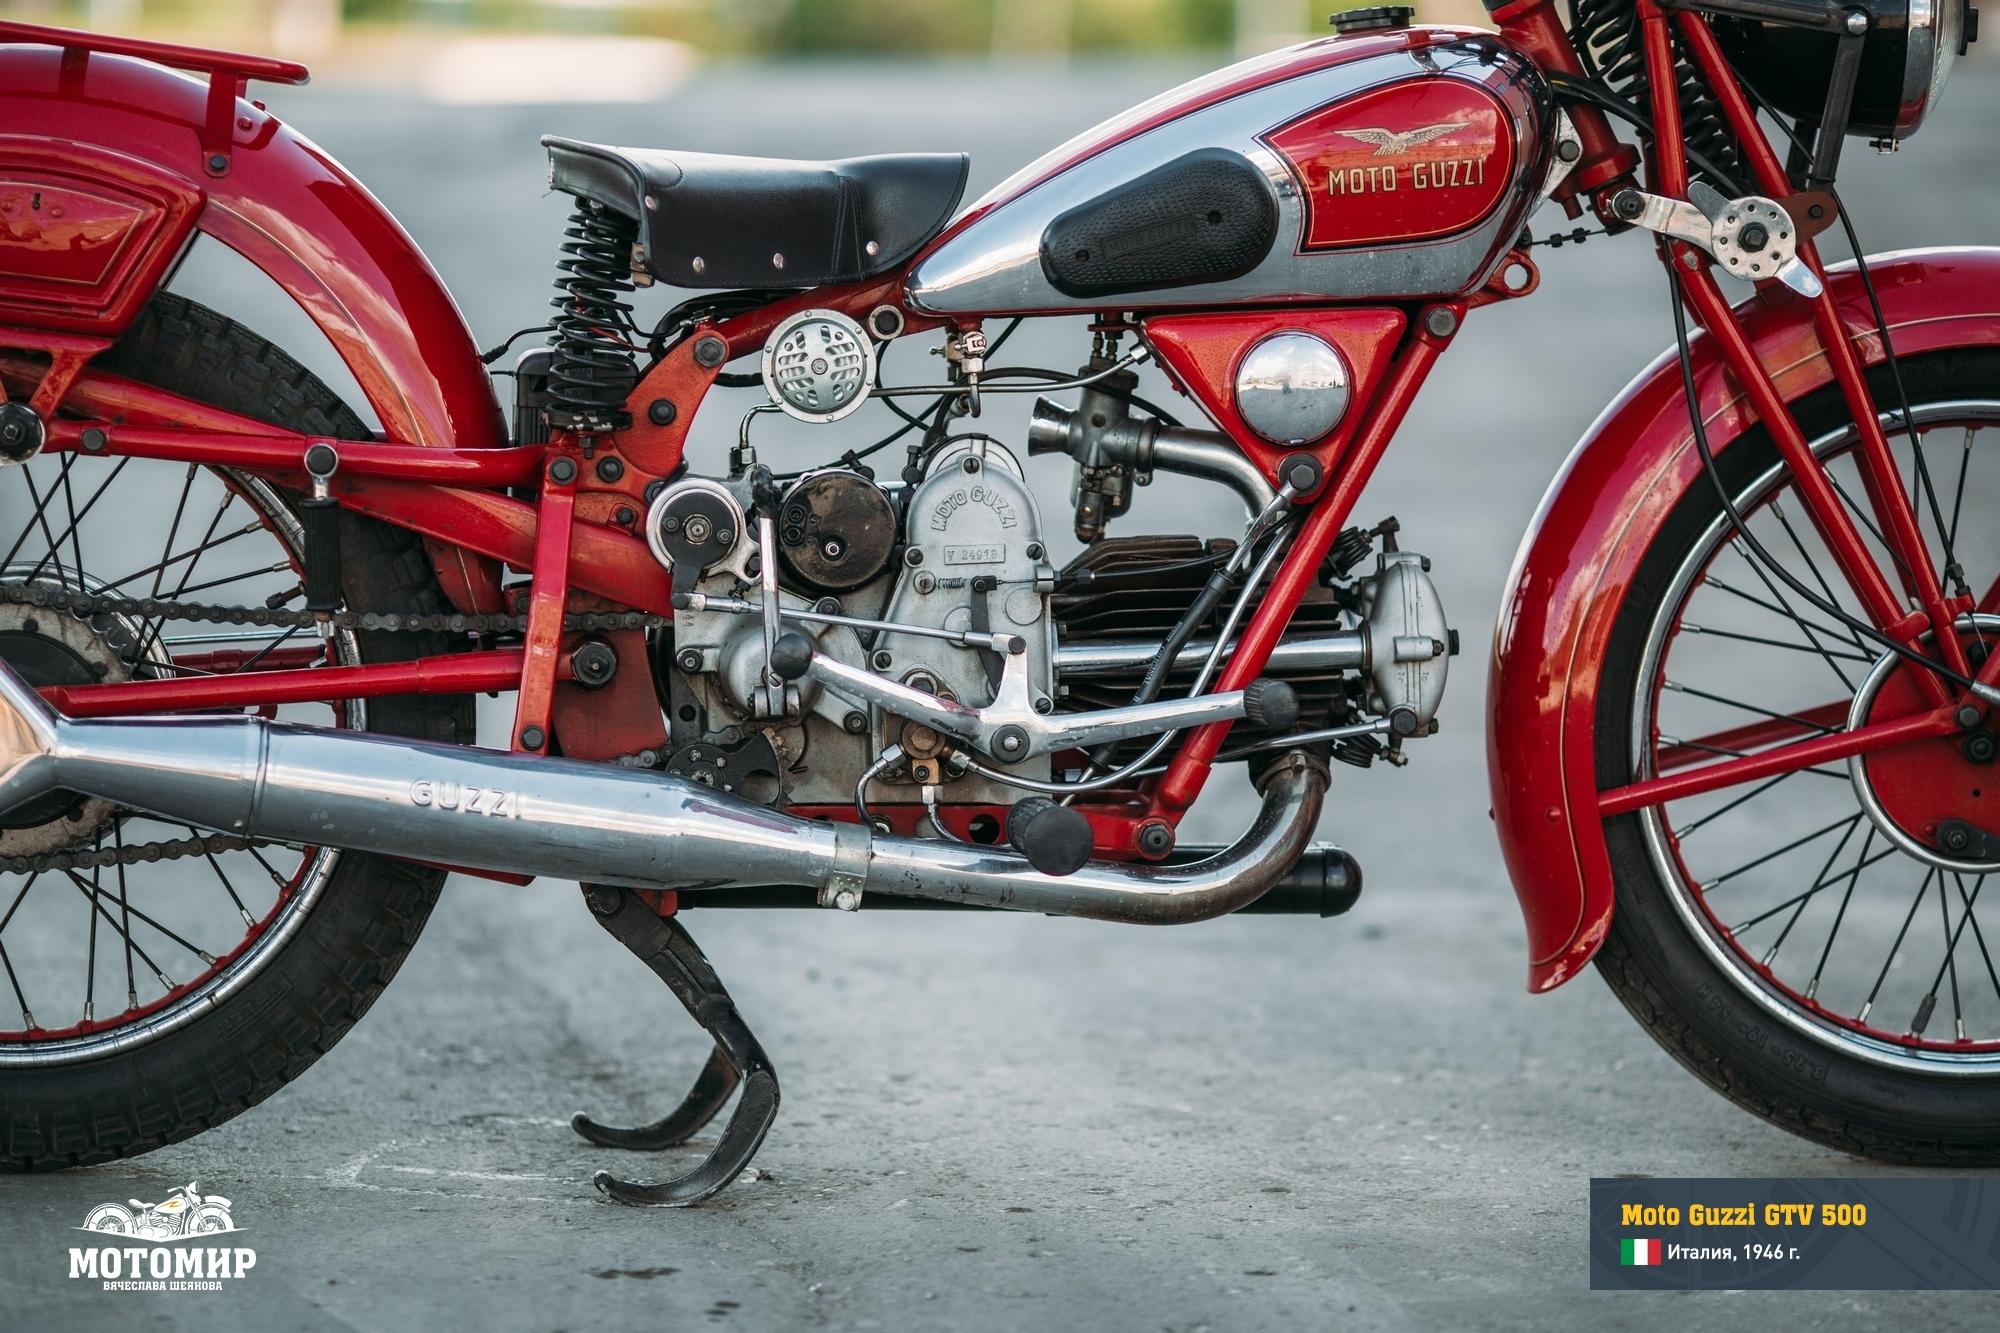 moto-guzzi-gtv-500-201509-web-09